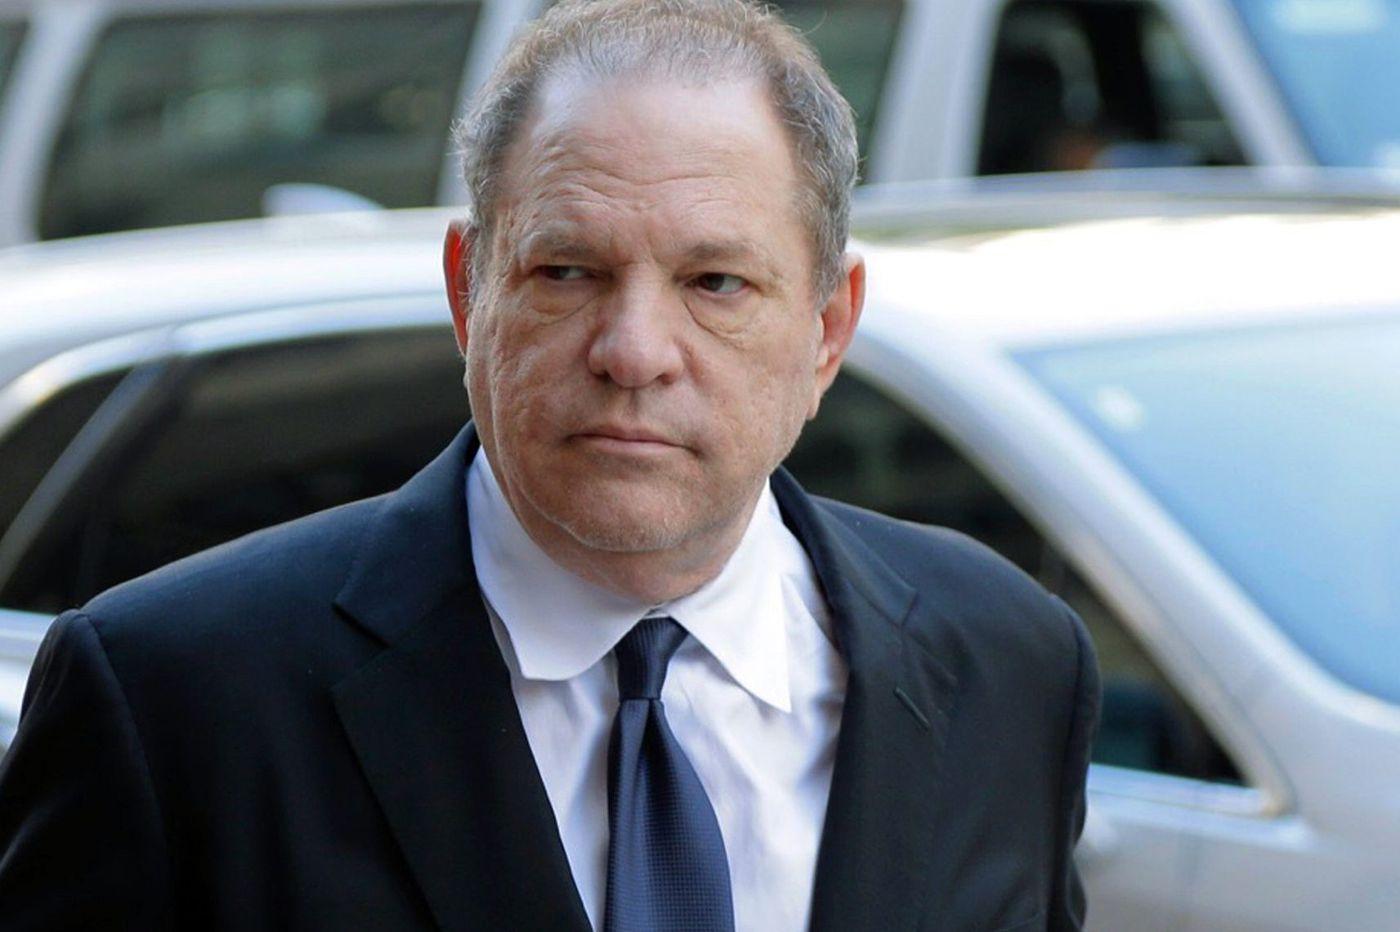 Ex-NBC News producer says network execs censored Harvey Weinstein story